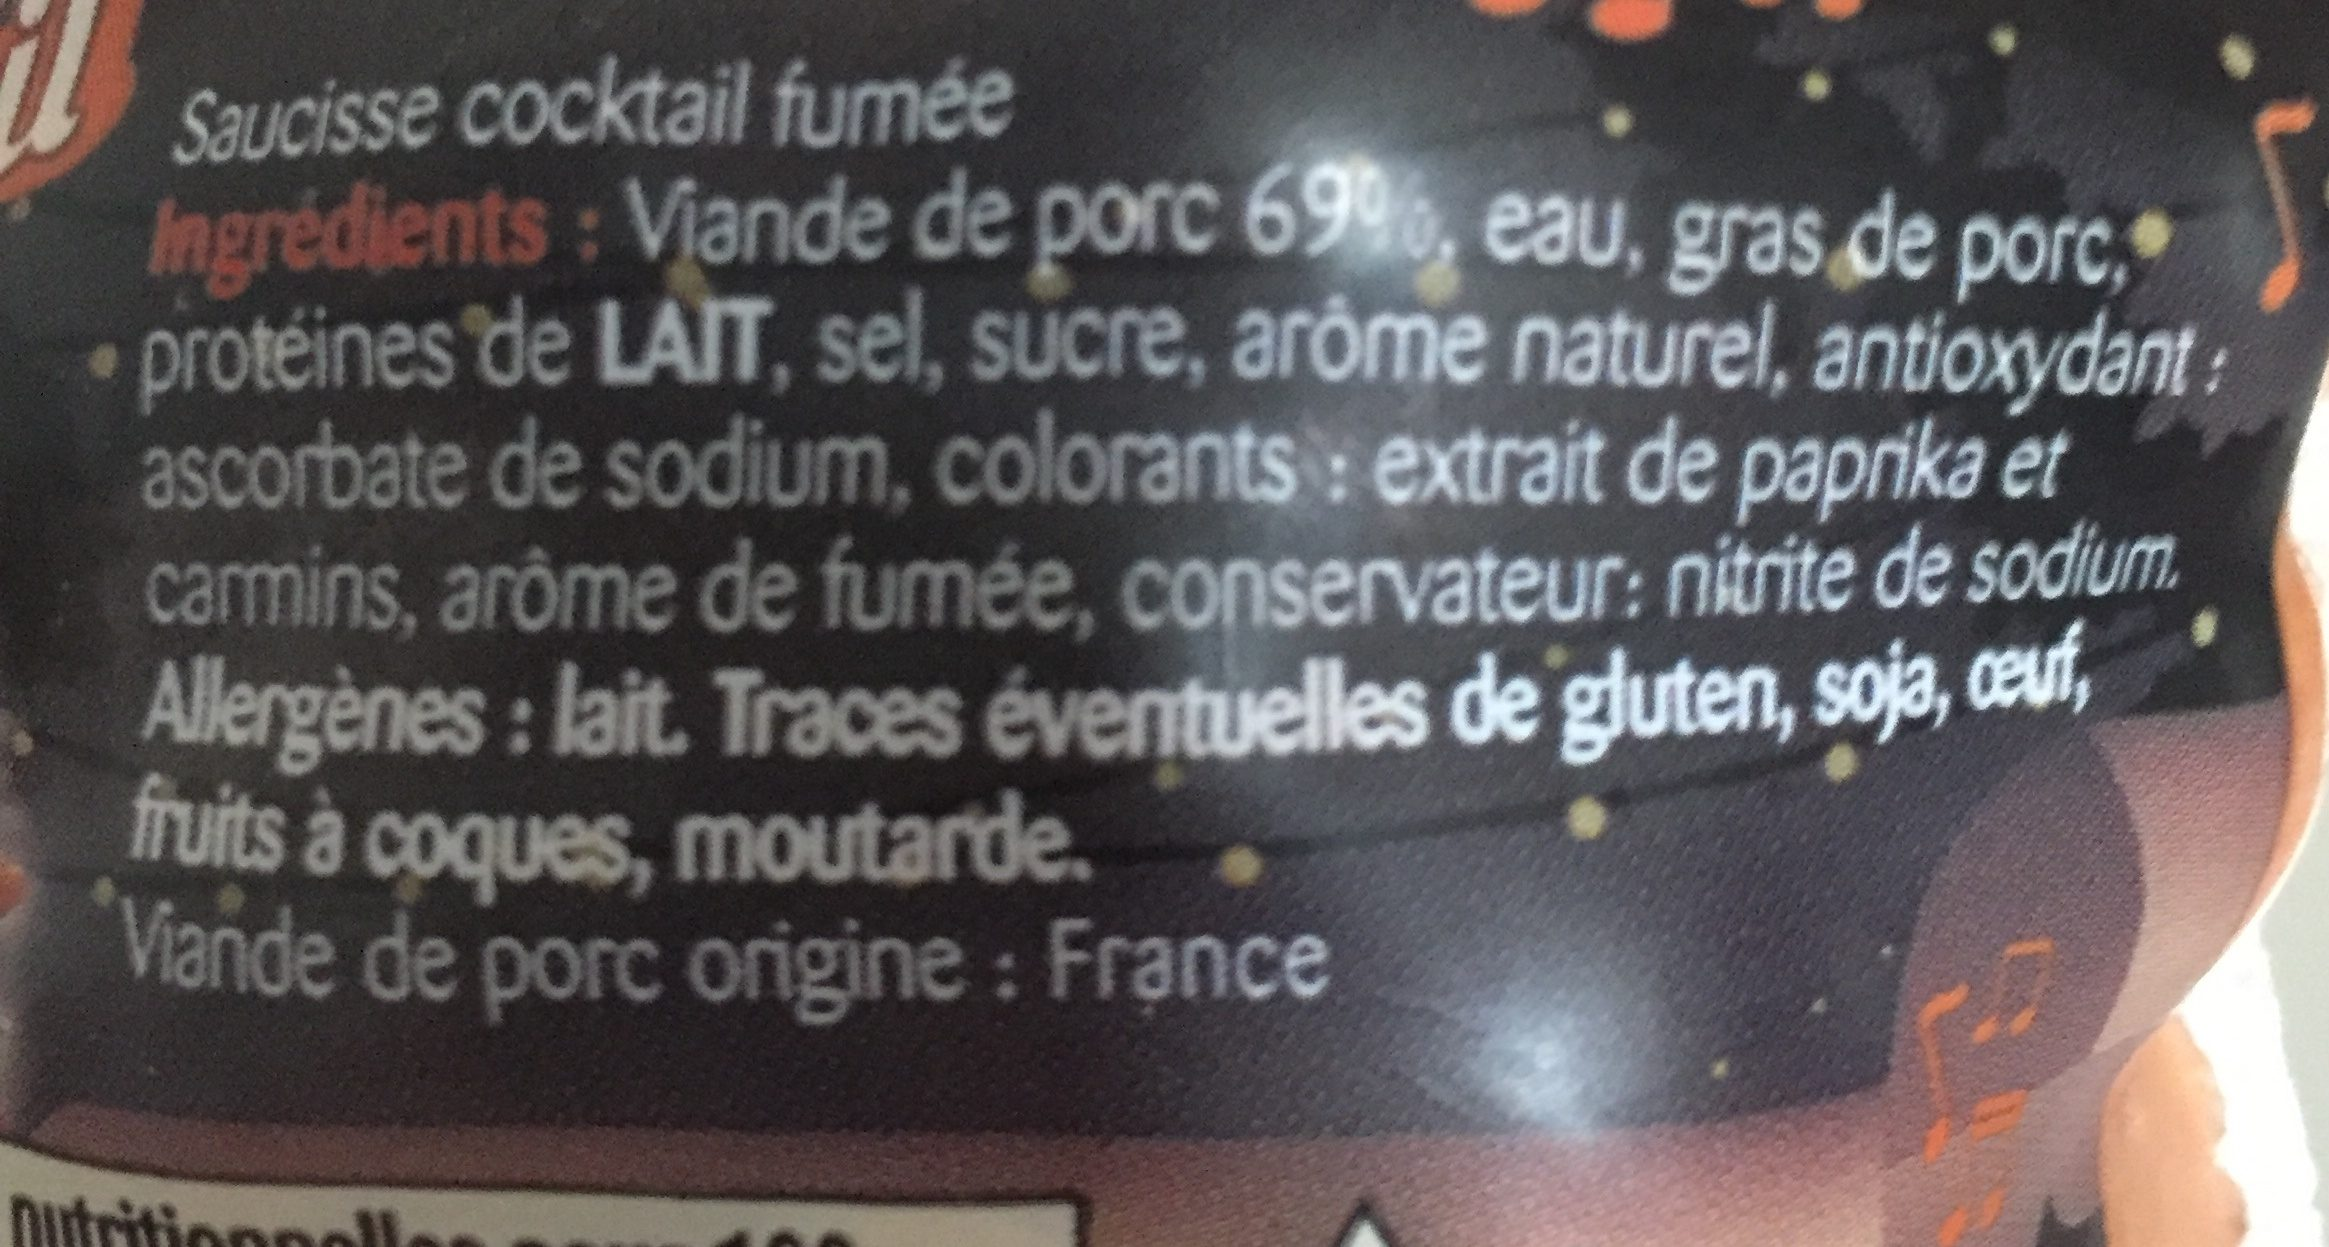 Saucisse Cocktail Nature - Ingrediënten